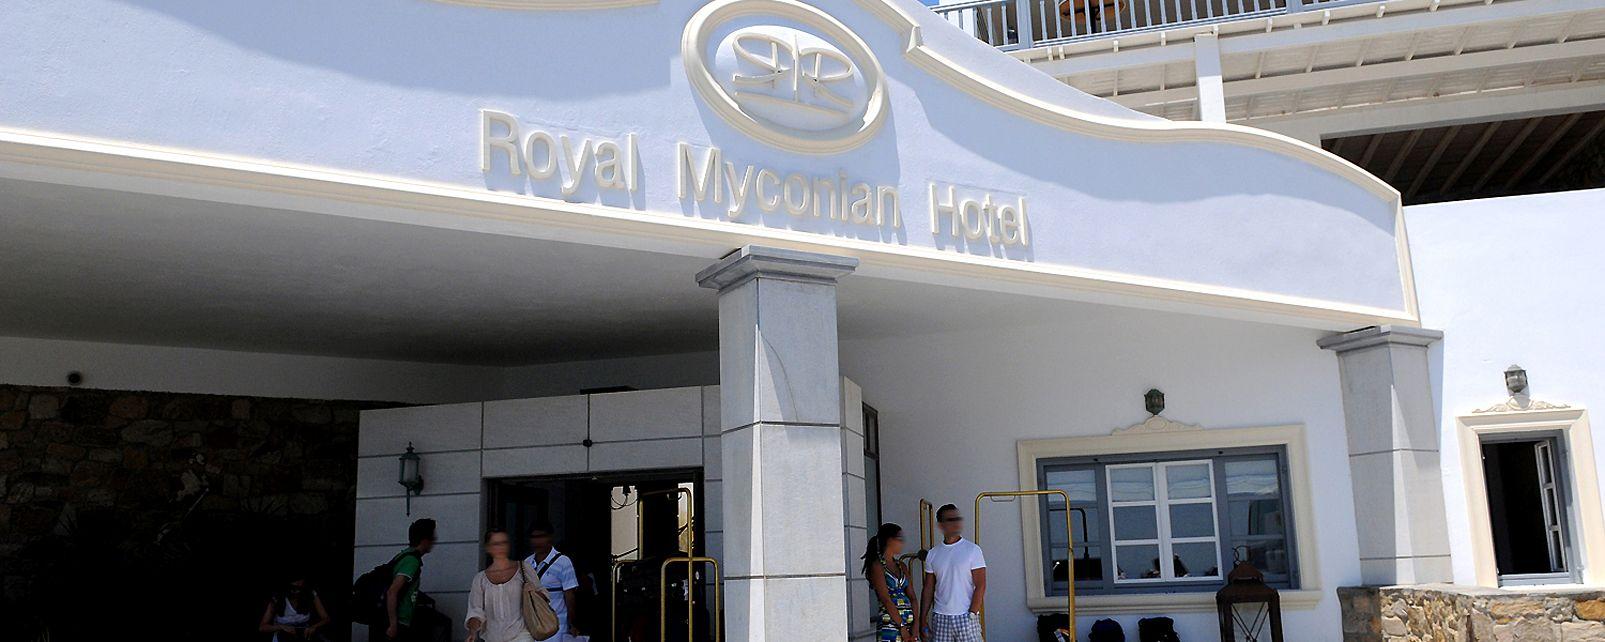 Hotel Royal Myconian